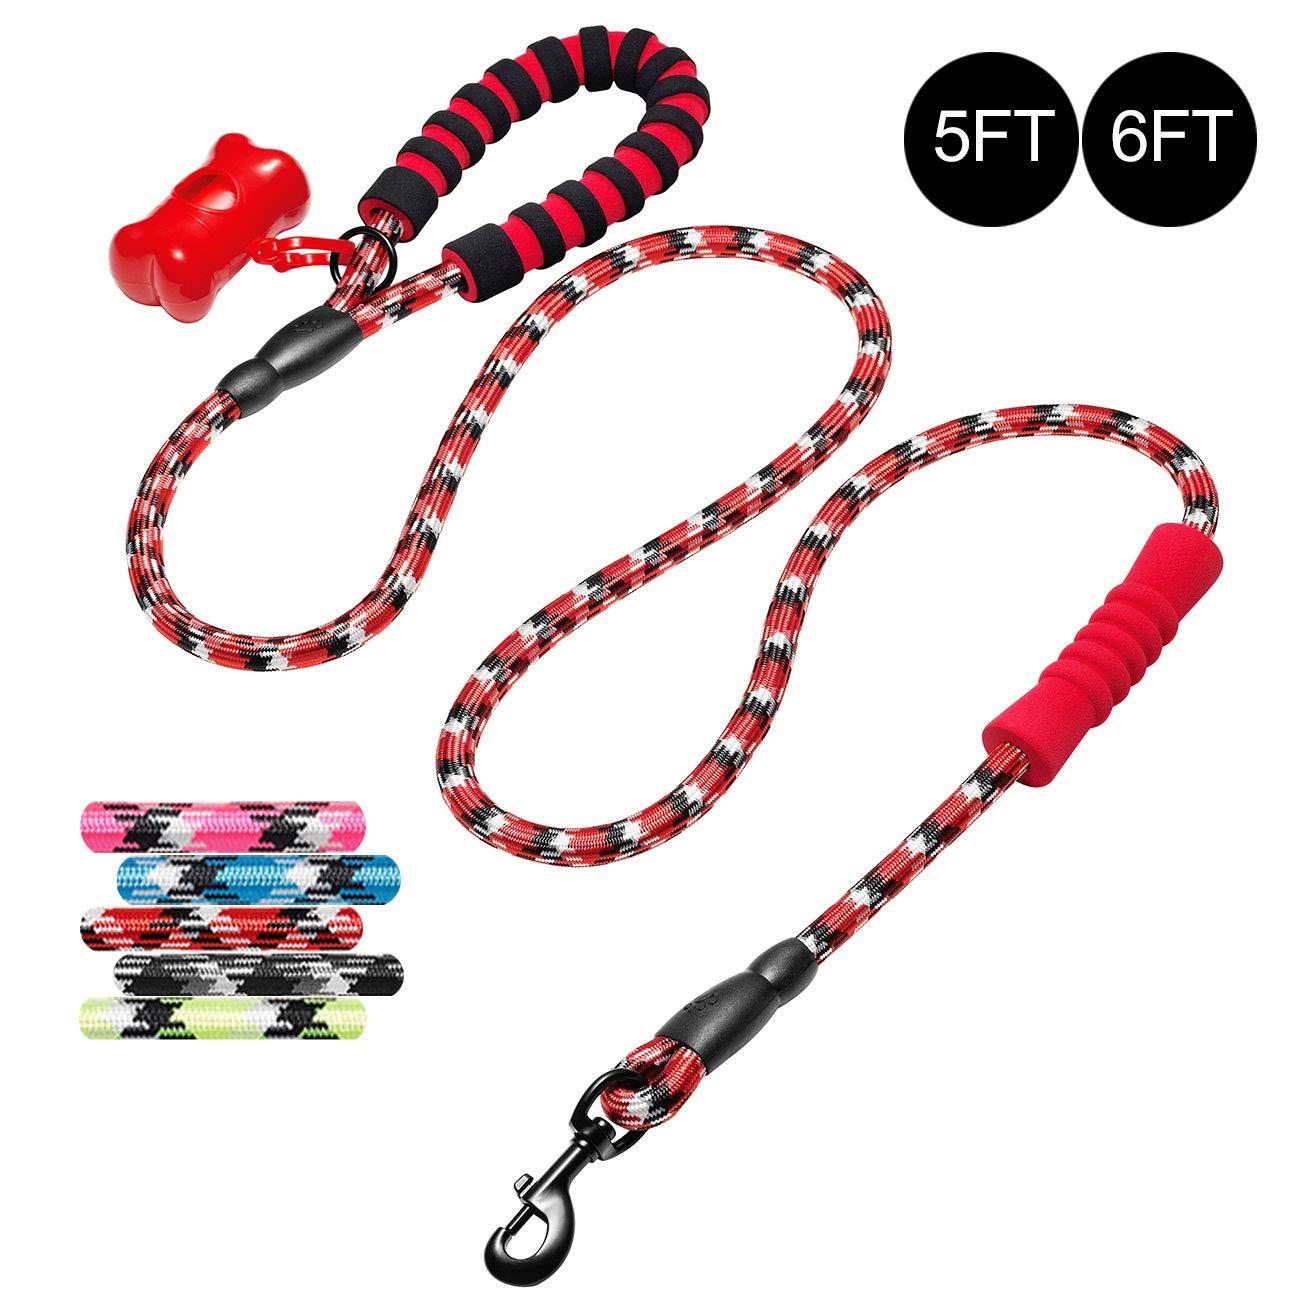 tobeDRI Heavy Duty Dog Leash with Foam Handle 5ft and 6ft Long - Dog Training Walking Leashes for Medium Large Dogs